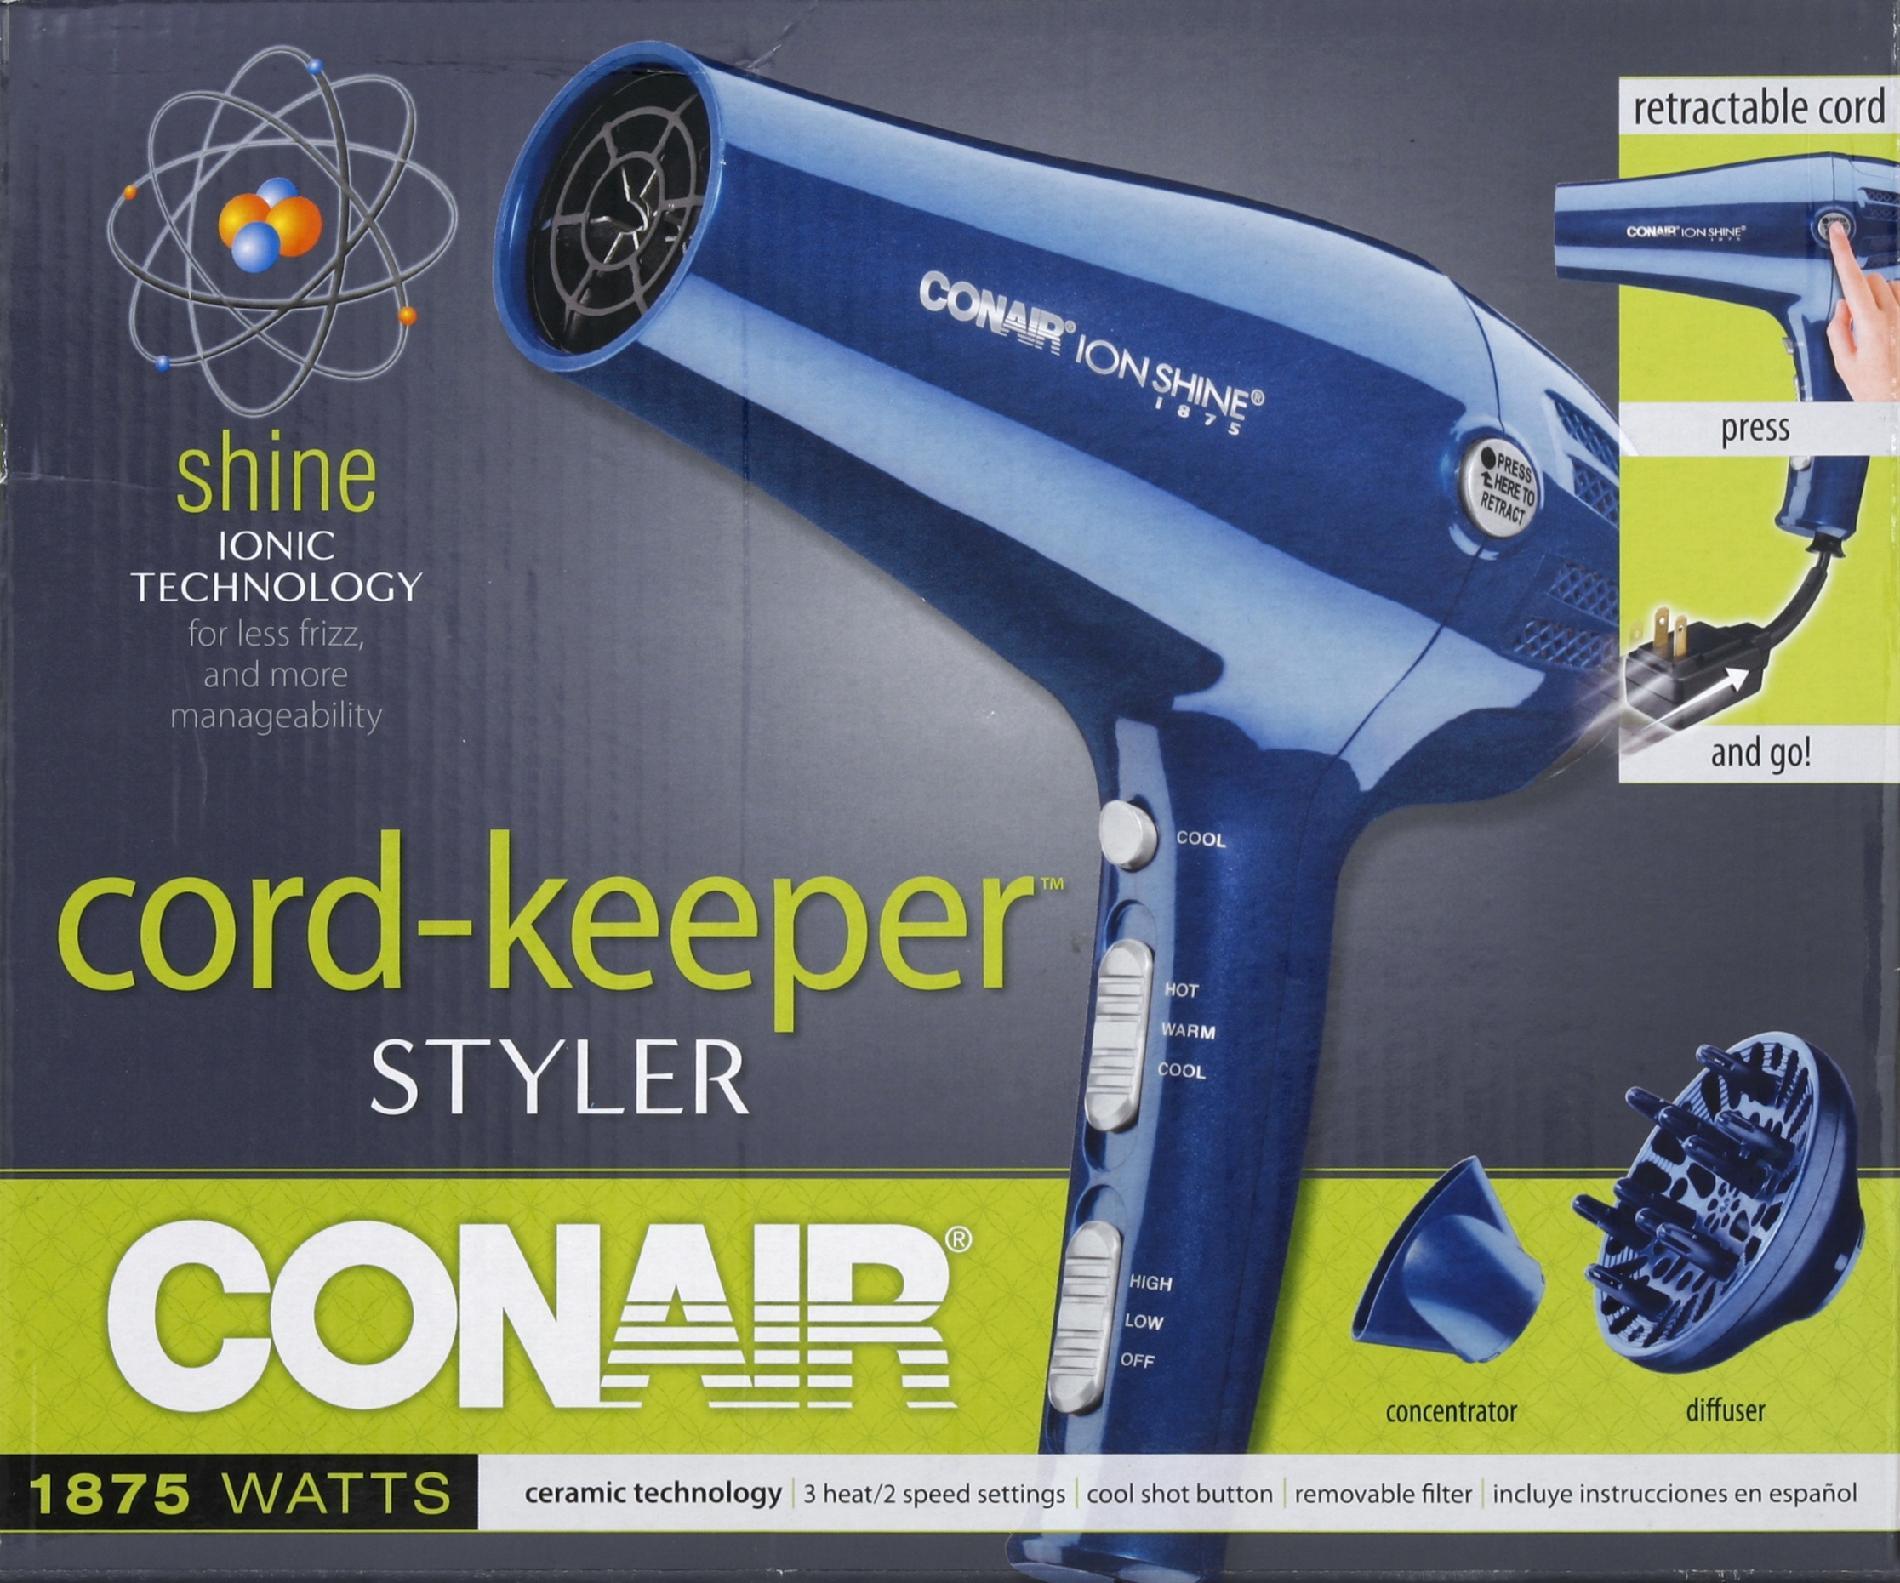 Conair Cord-Keeper Styler, 1875 Watts, 1 styler